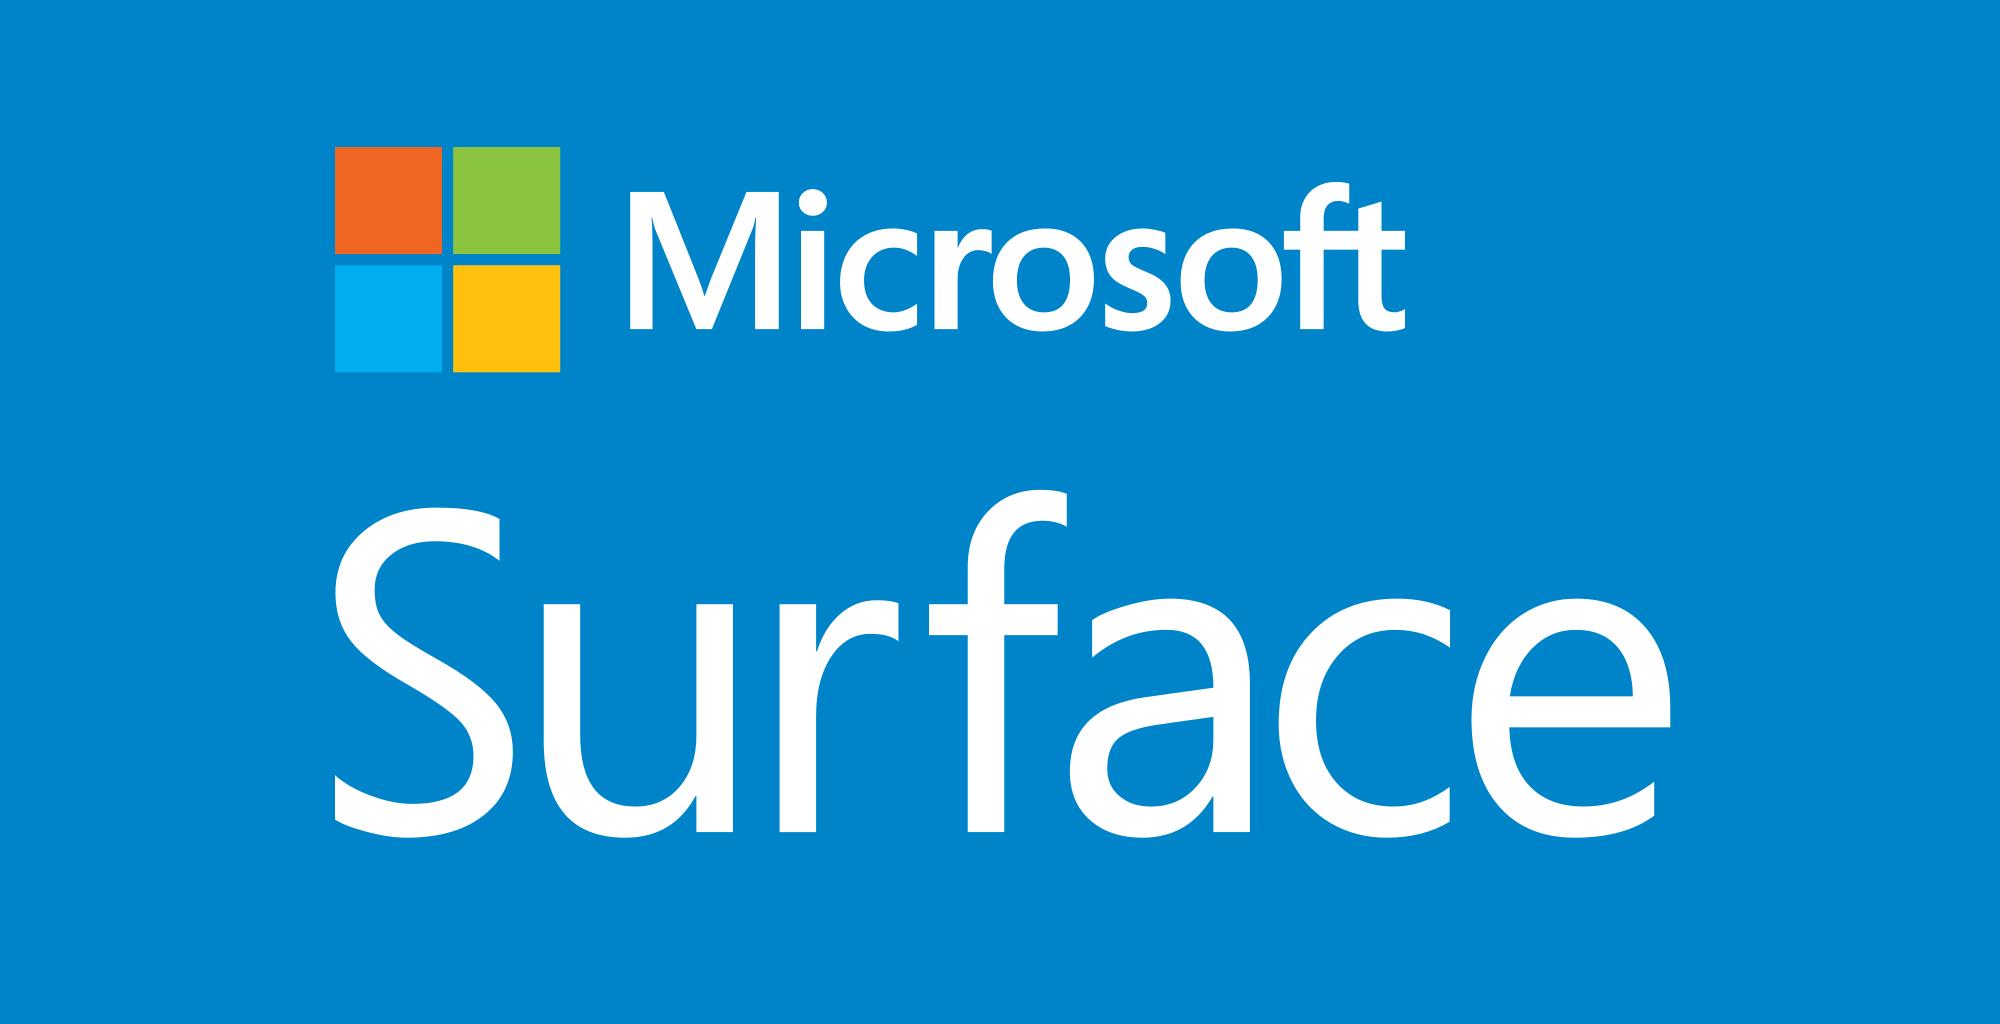 microsoft-surface-logo-271015